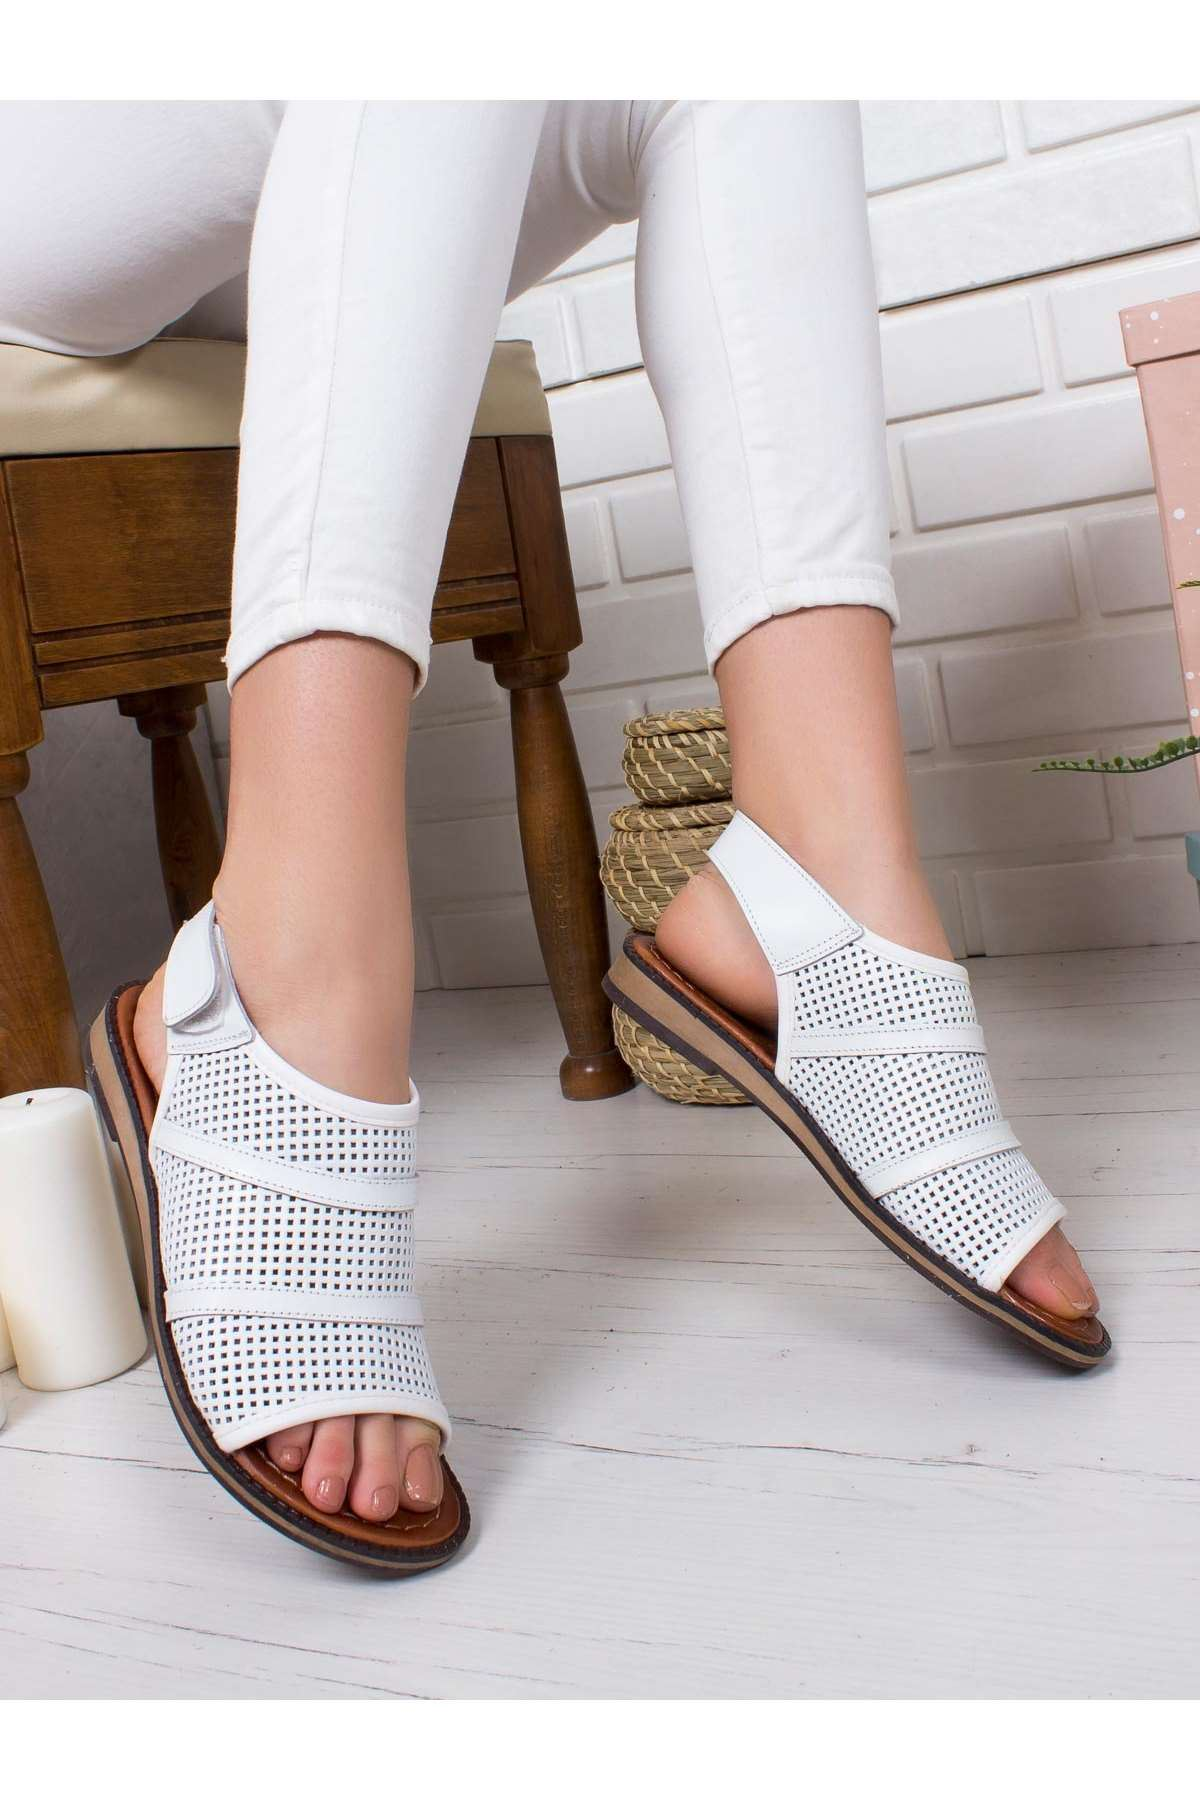 Star Hakiki Deri Sandalet BEYAZ